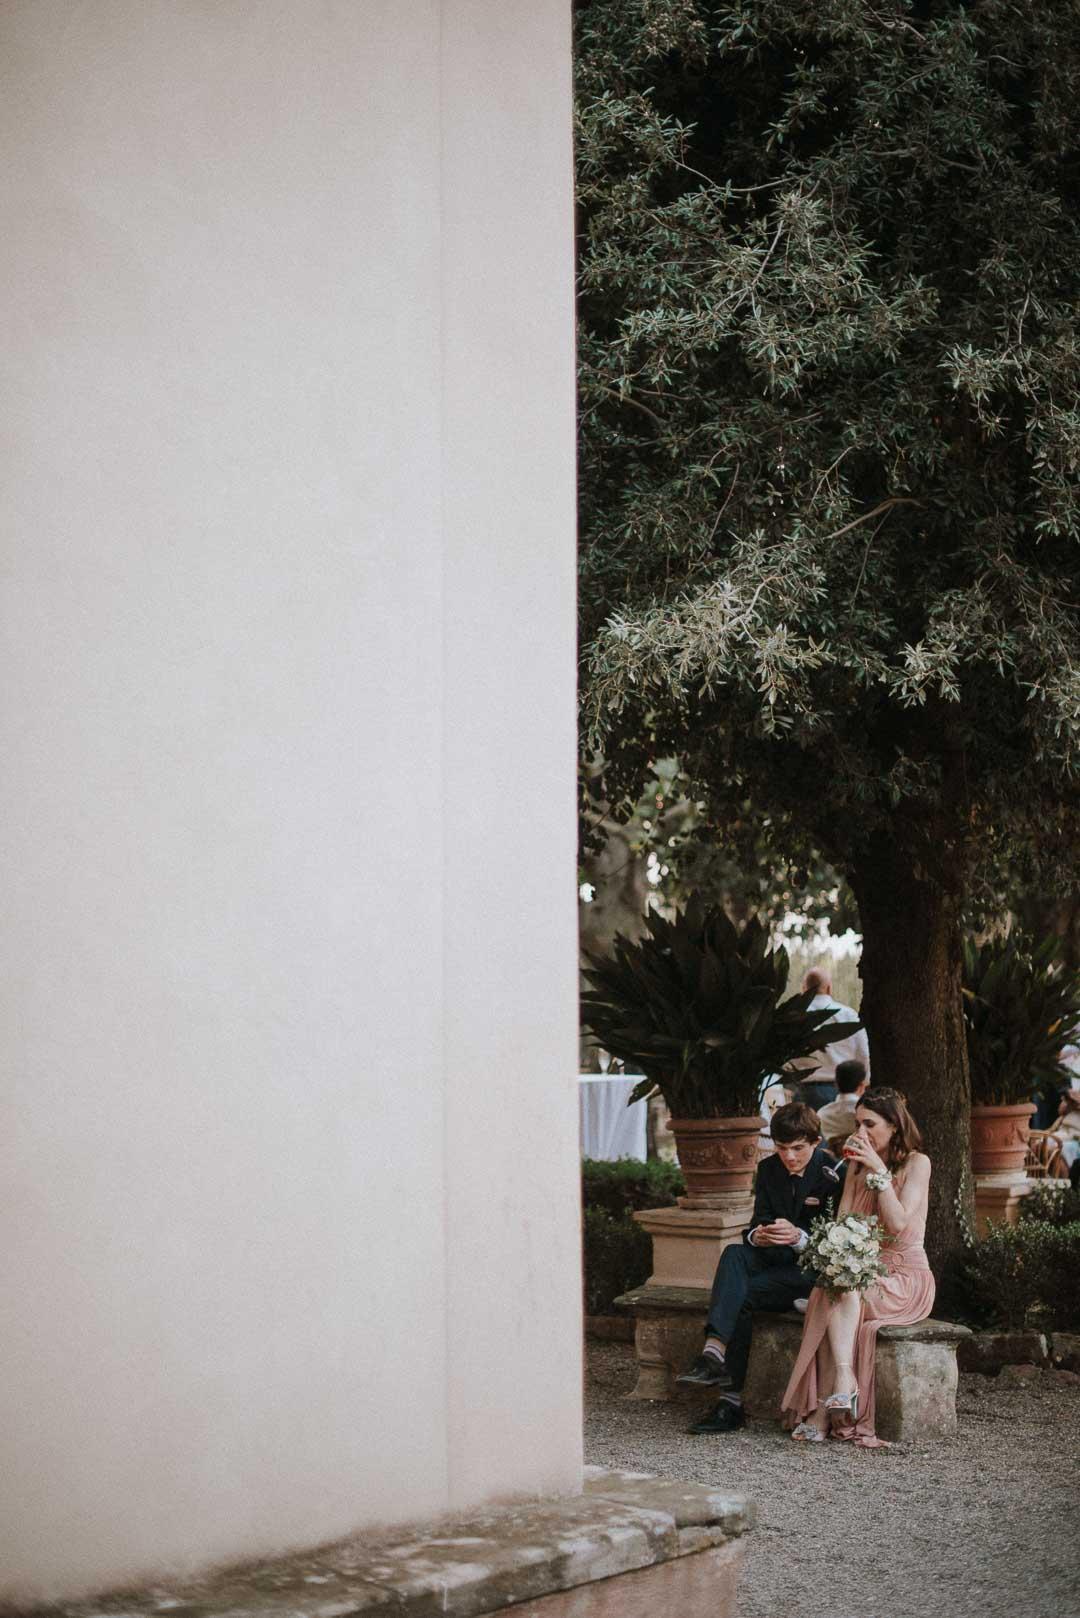 wedding-photographer-destination-fineart-bespoke-reportage-tuscany-villascorzi-vivianeizzo-spazio46-155